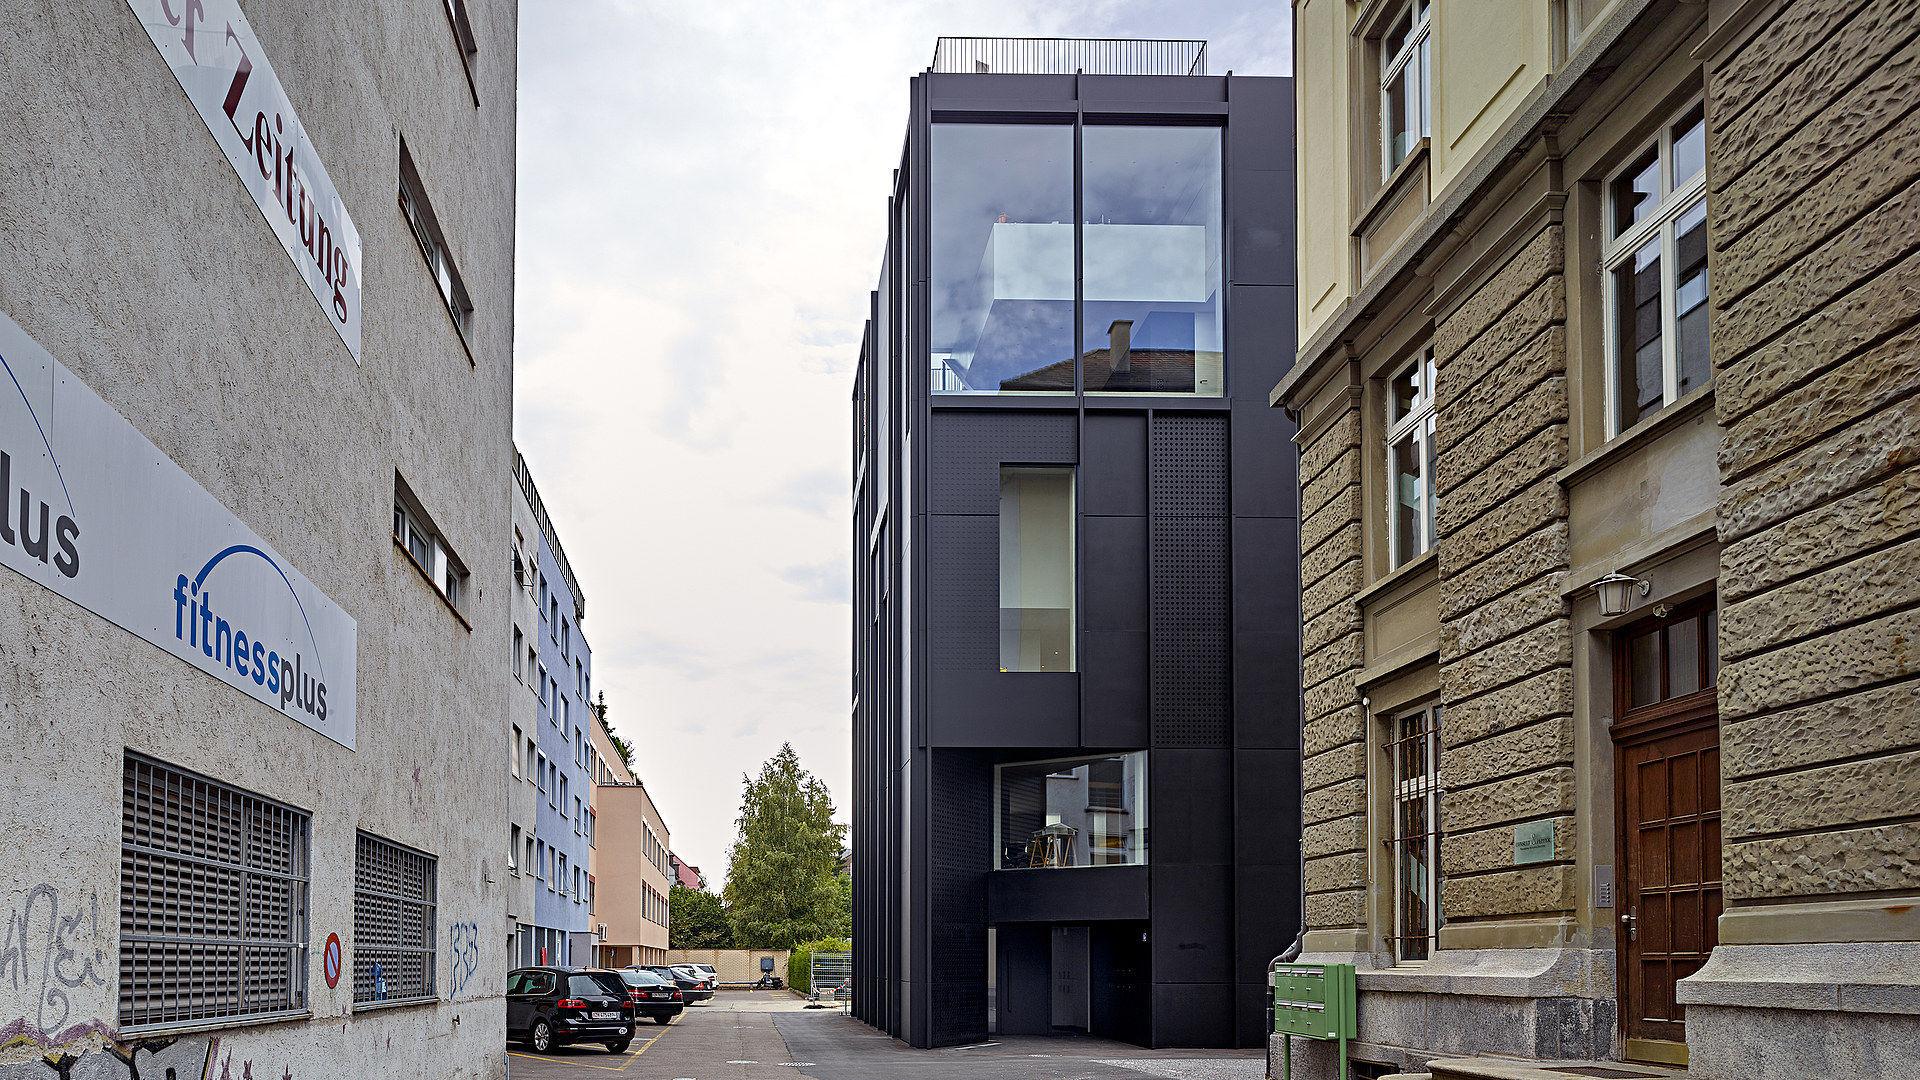 Beeindruckend Fassade Mit Blech Verkleiden Sammlung Von Blech-fassadenverkleidung / Matt / Platten / Für